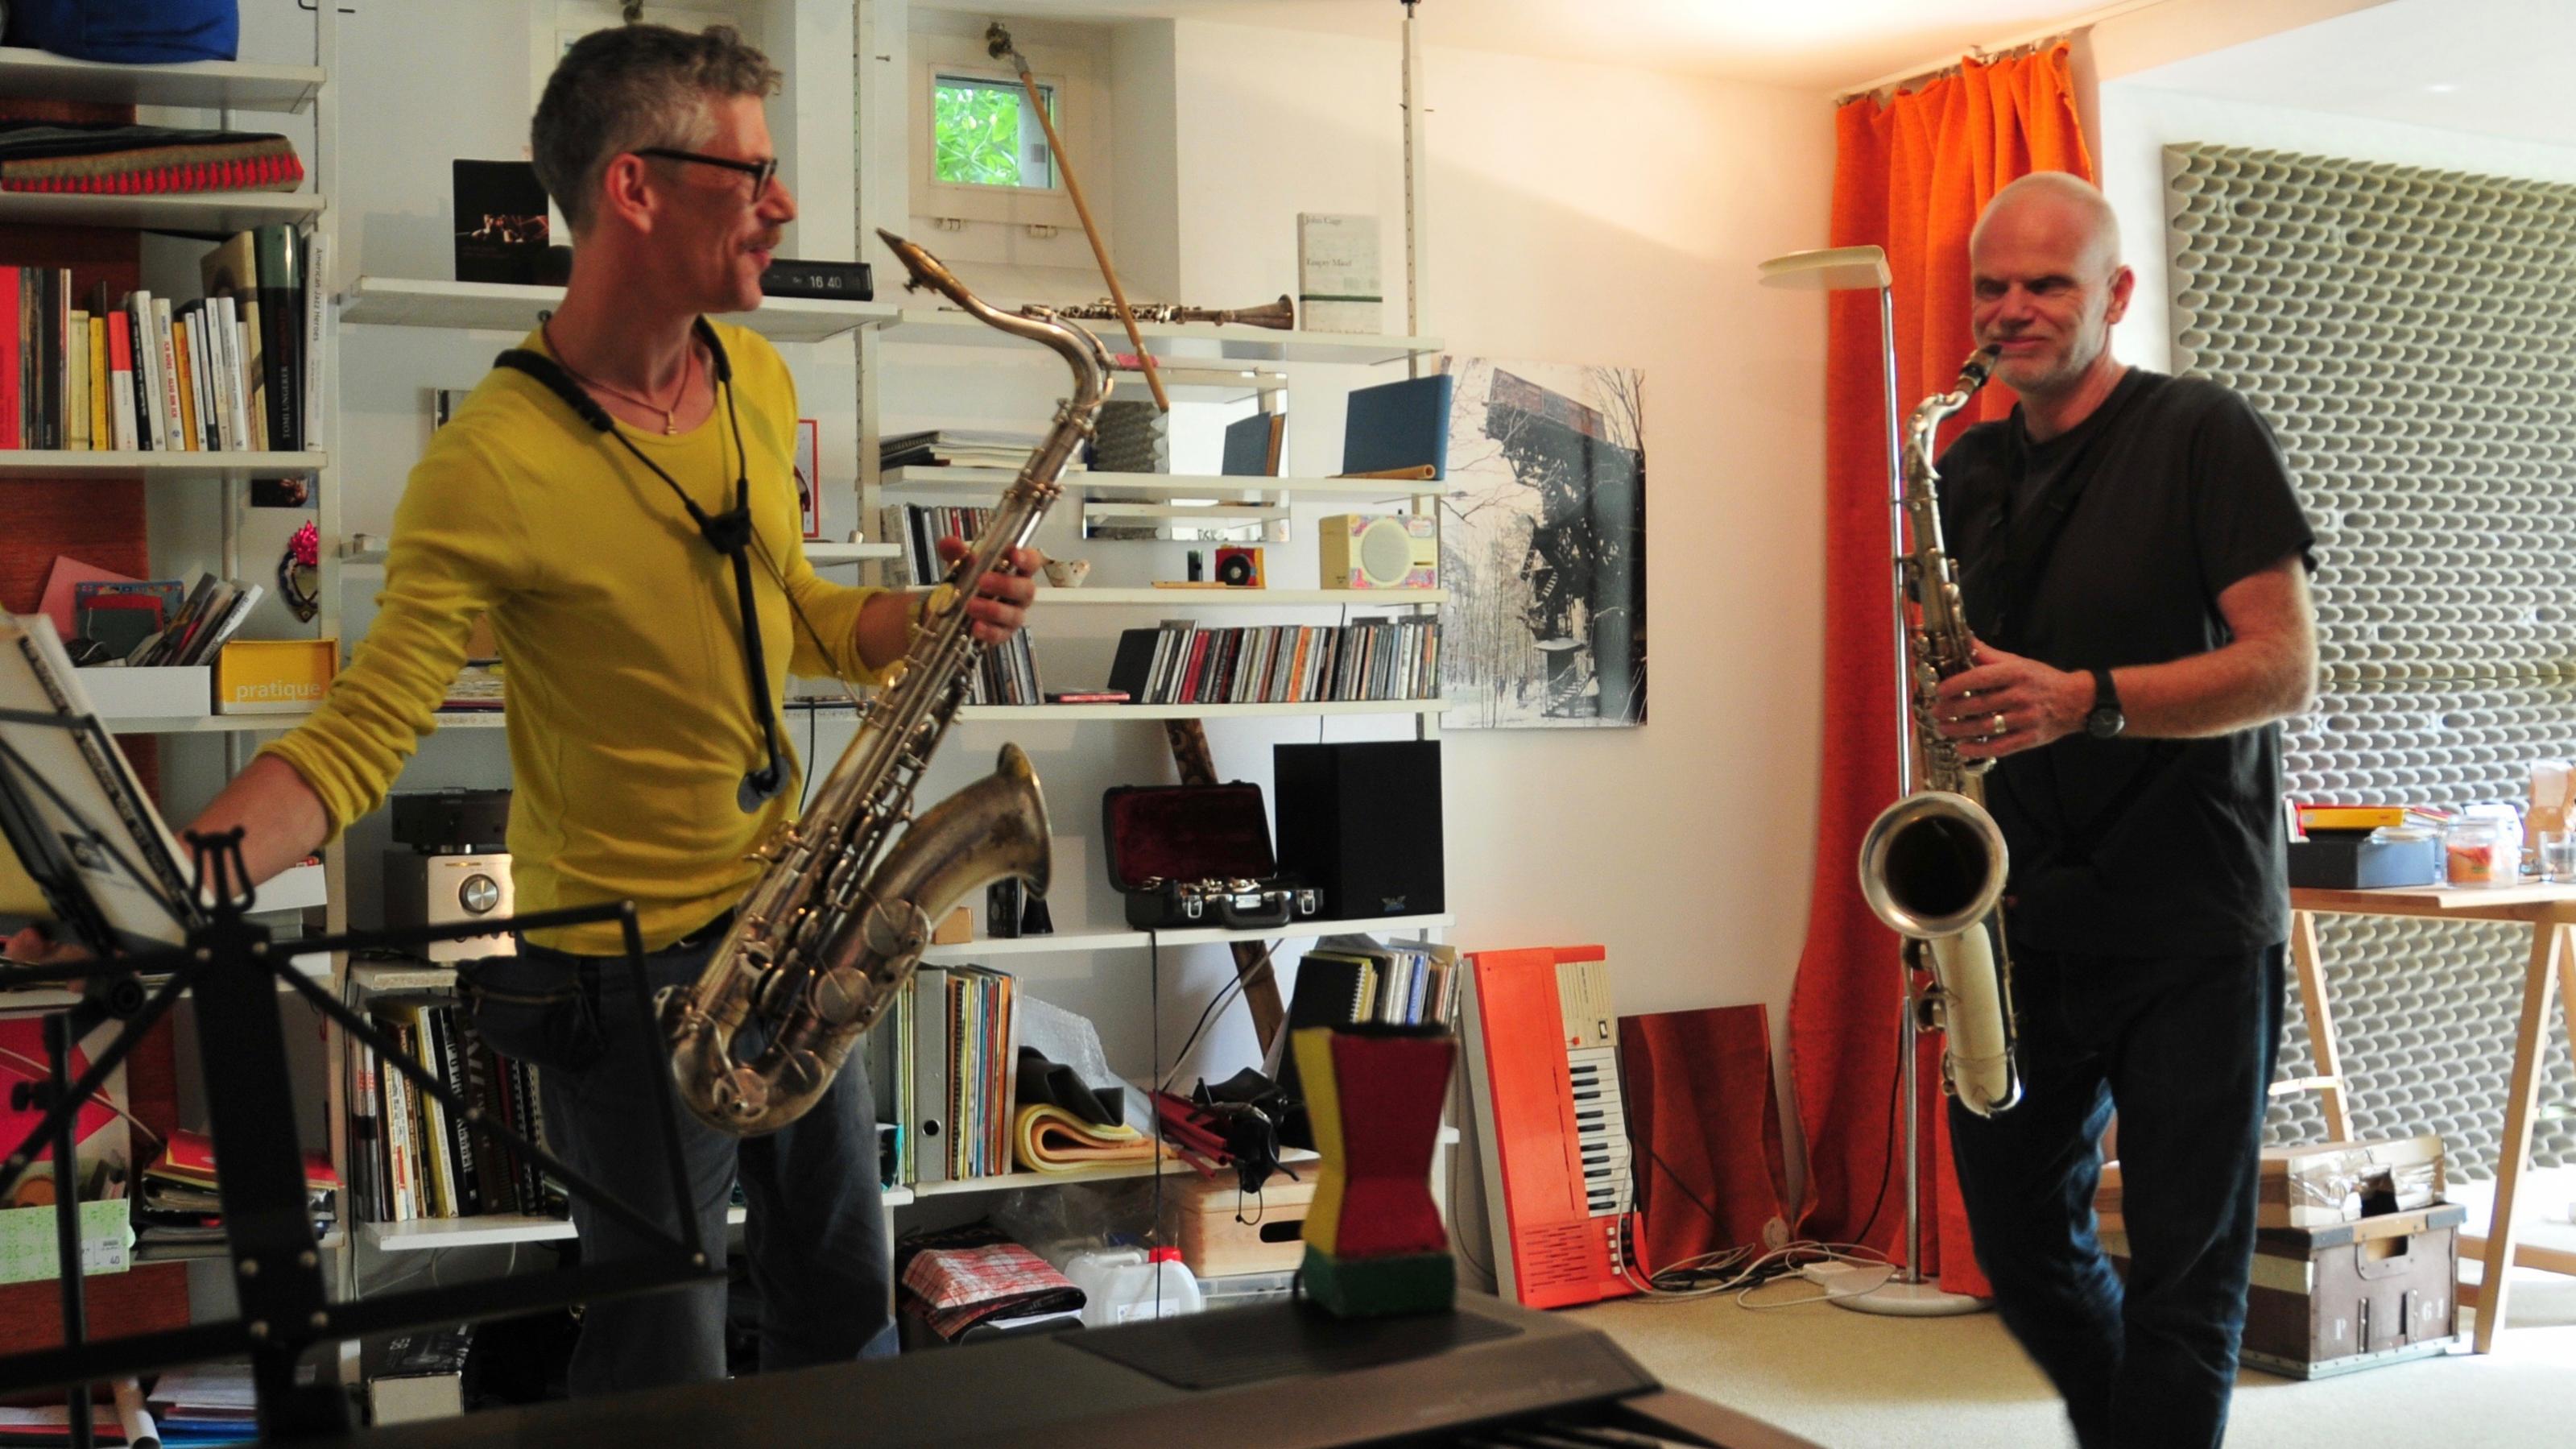 Saxophon lernen mit Spass / Foto Maximilian Jaeger